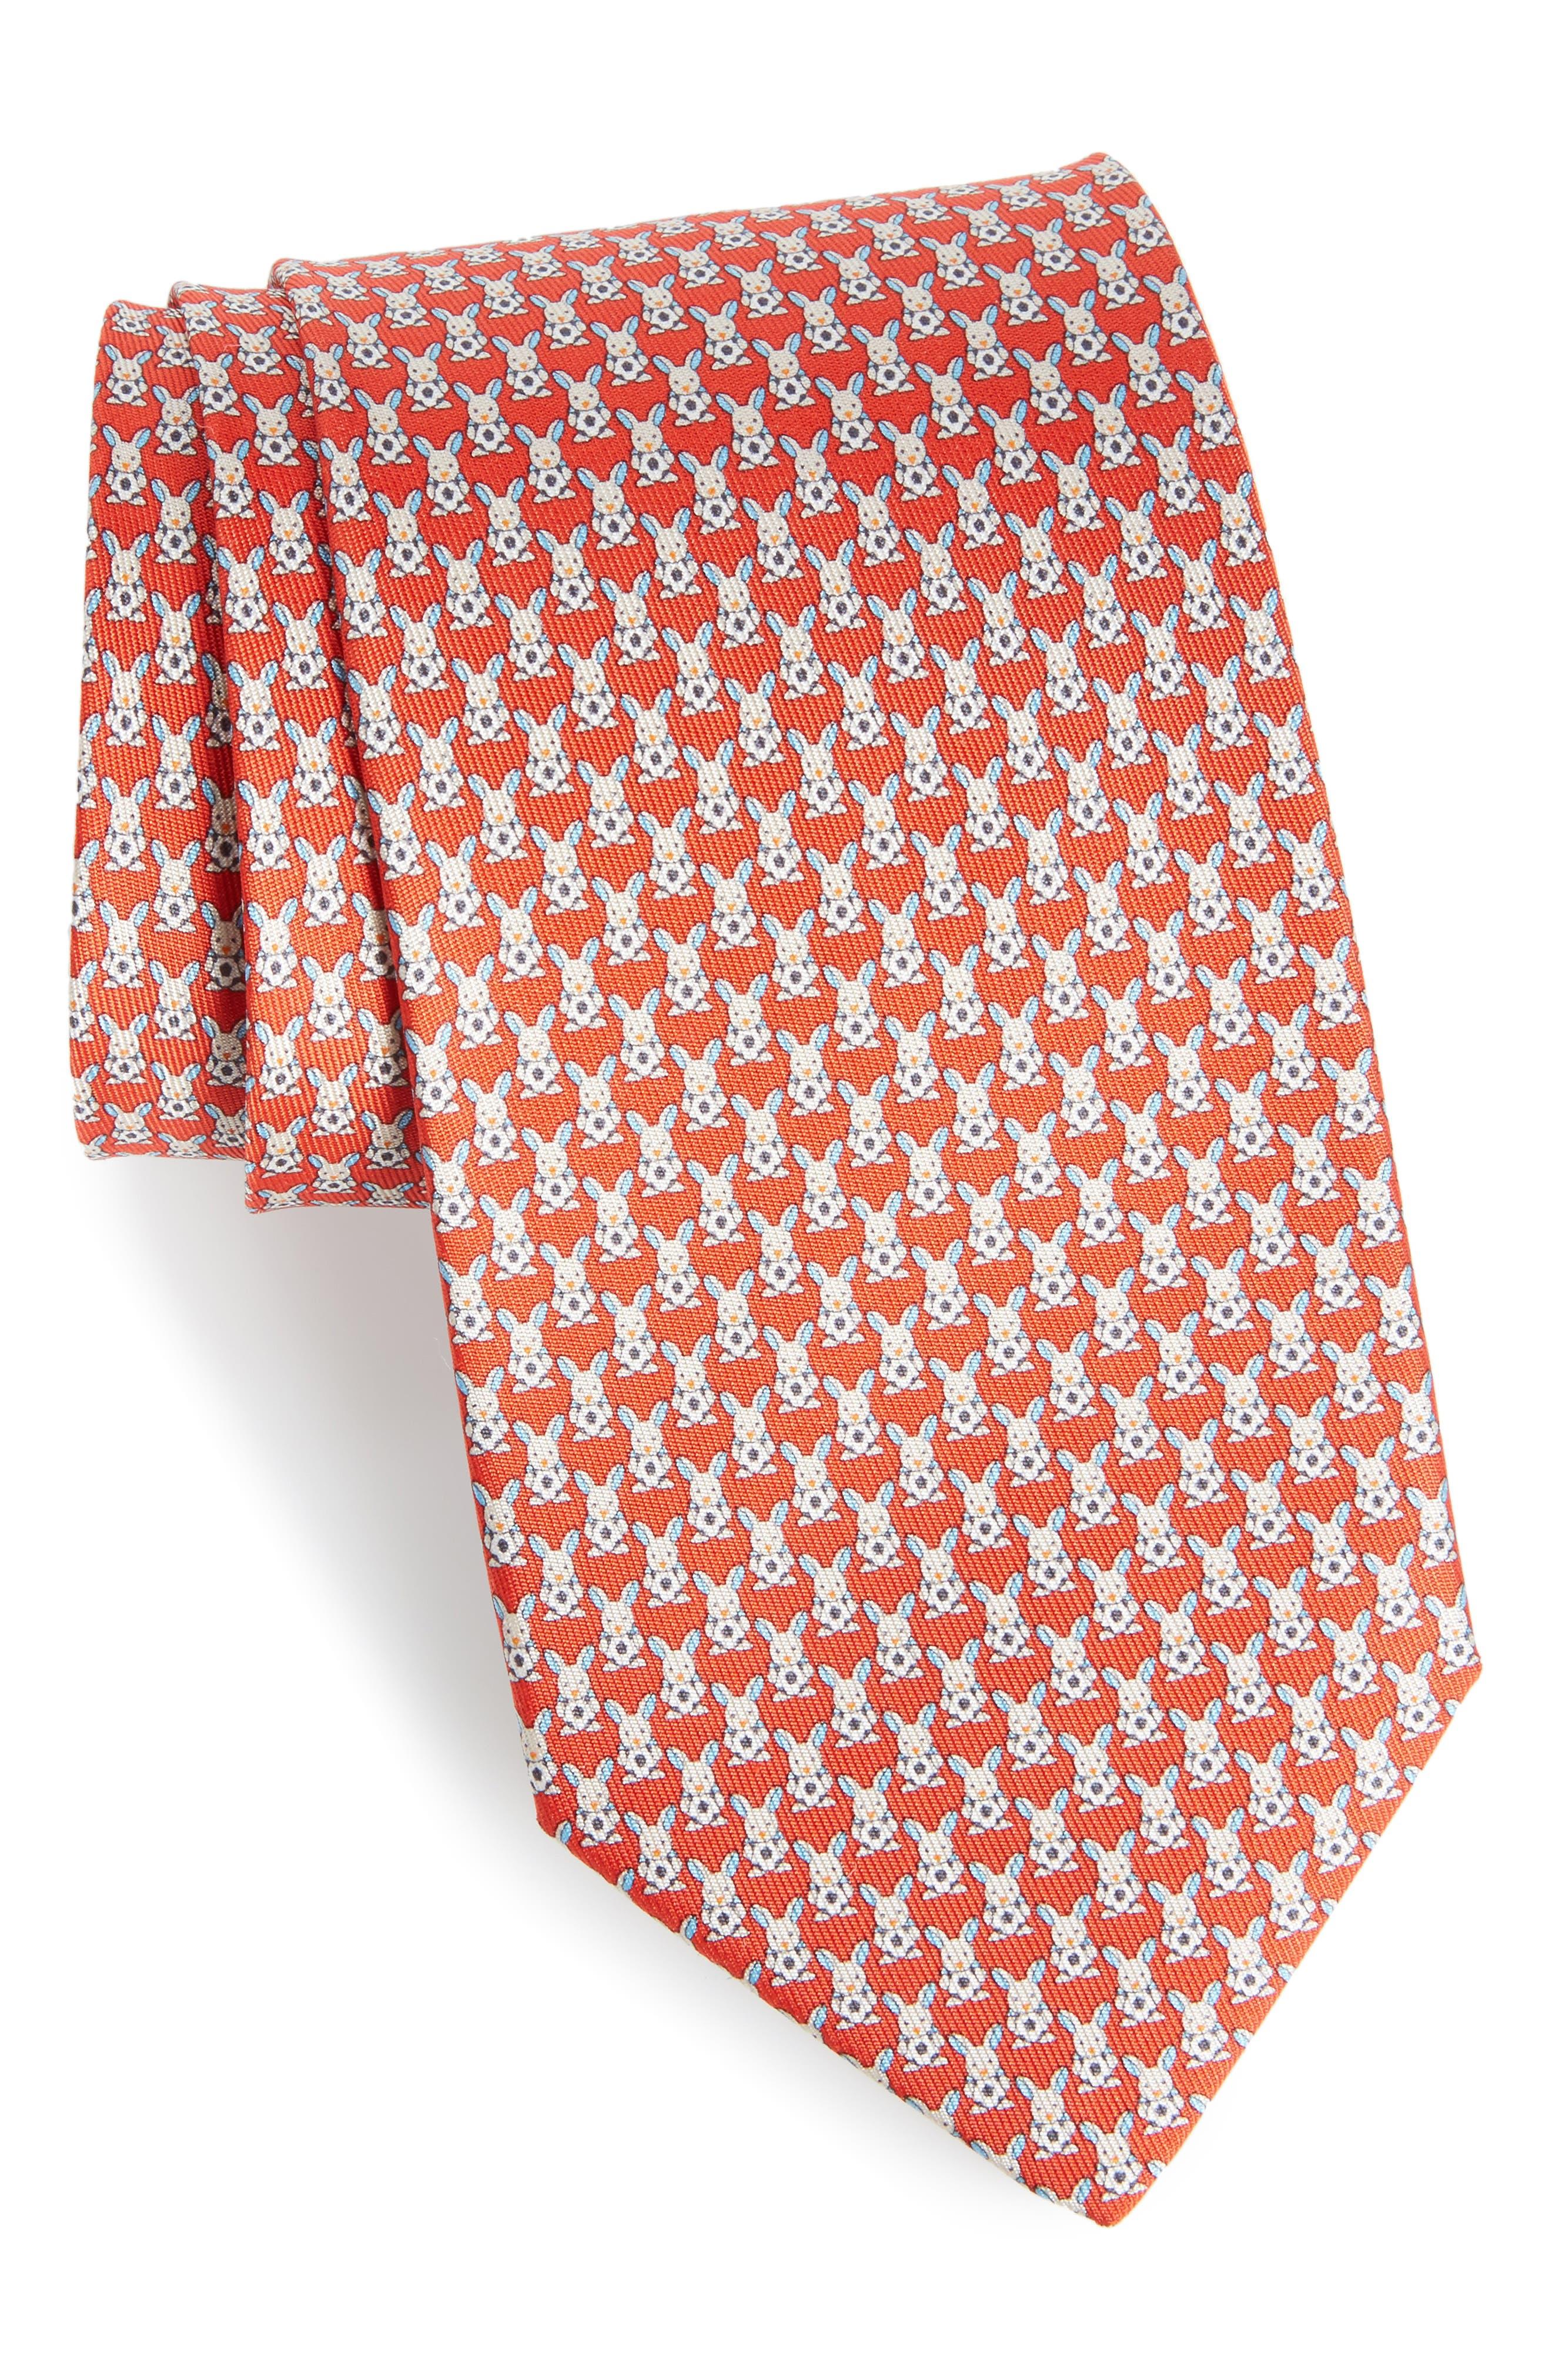 Main Image - Salvatore Ferragamo Errico Bunny Print Silk Tie